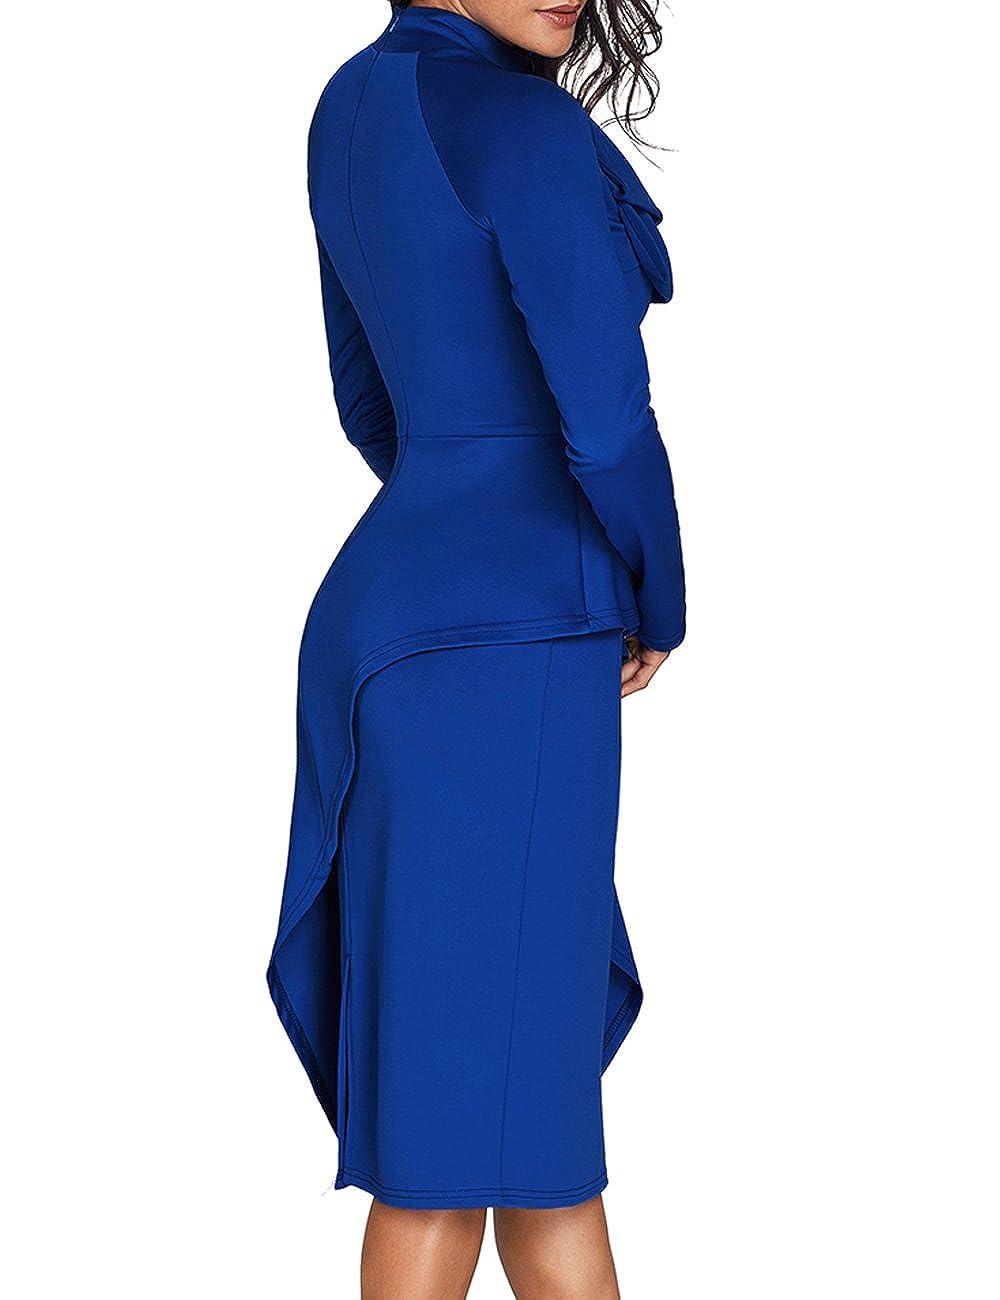 83f3107b183 CICIDES Womens Tie Neck Peplum Waist Long Sleeve Bodycon Business Dress(S-XXL)  at Amazon Women s Clothing store